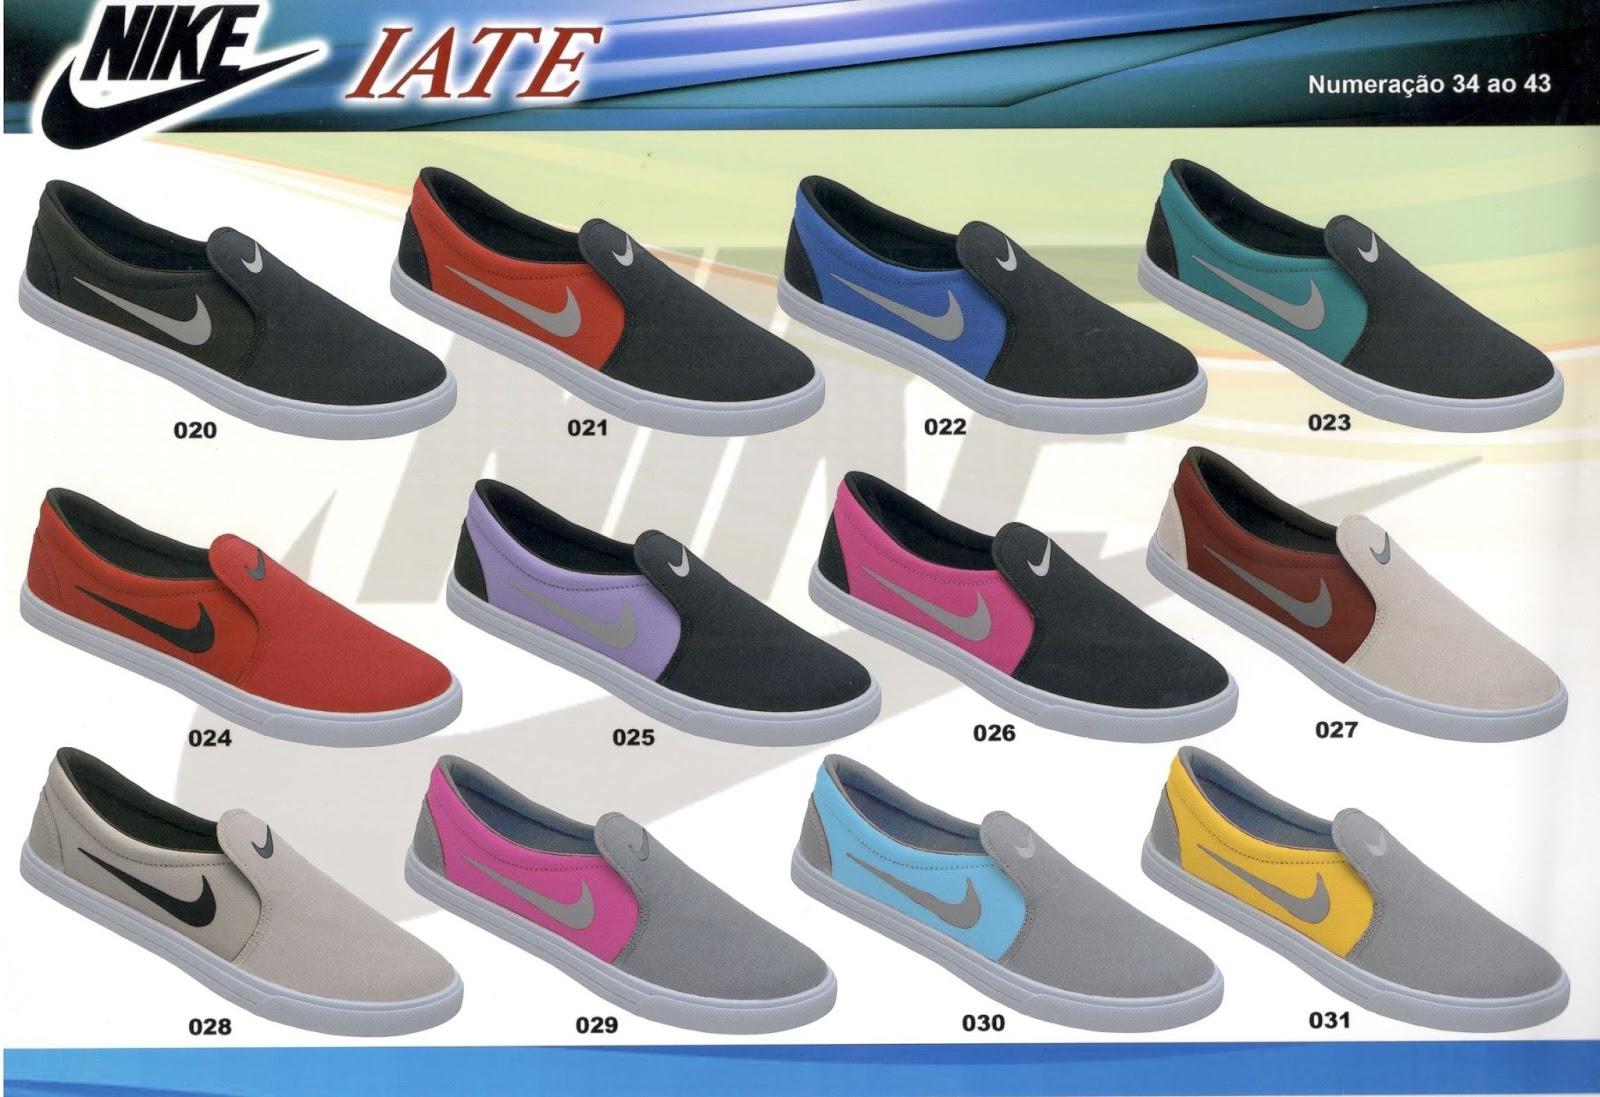 7686f69dba Atacadão dos Tênis ... Didio-Shoes Distribuidora WhatsApp  (51) 92115191